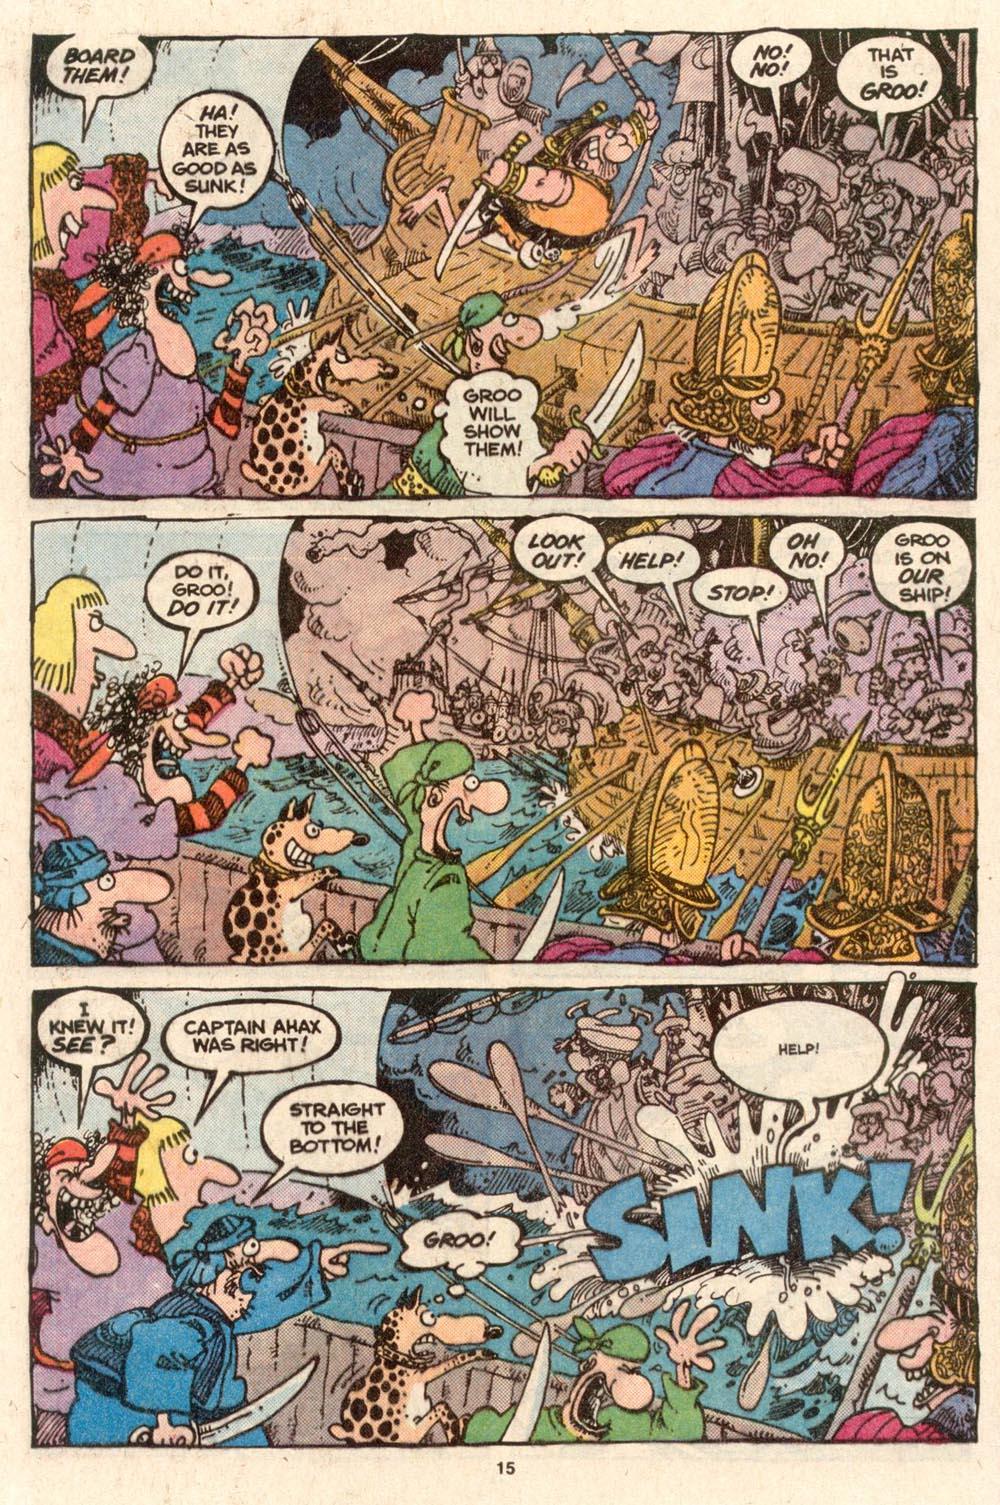 Read online Sergio Aragonés Groo the Wanderer comic -  Issue #54 - 15